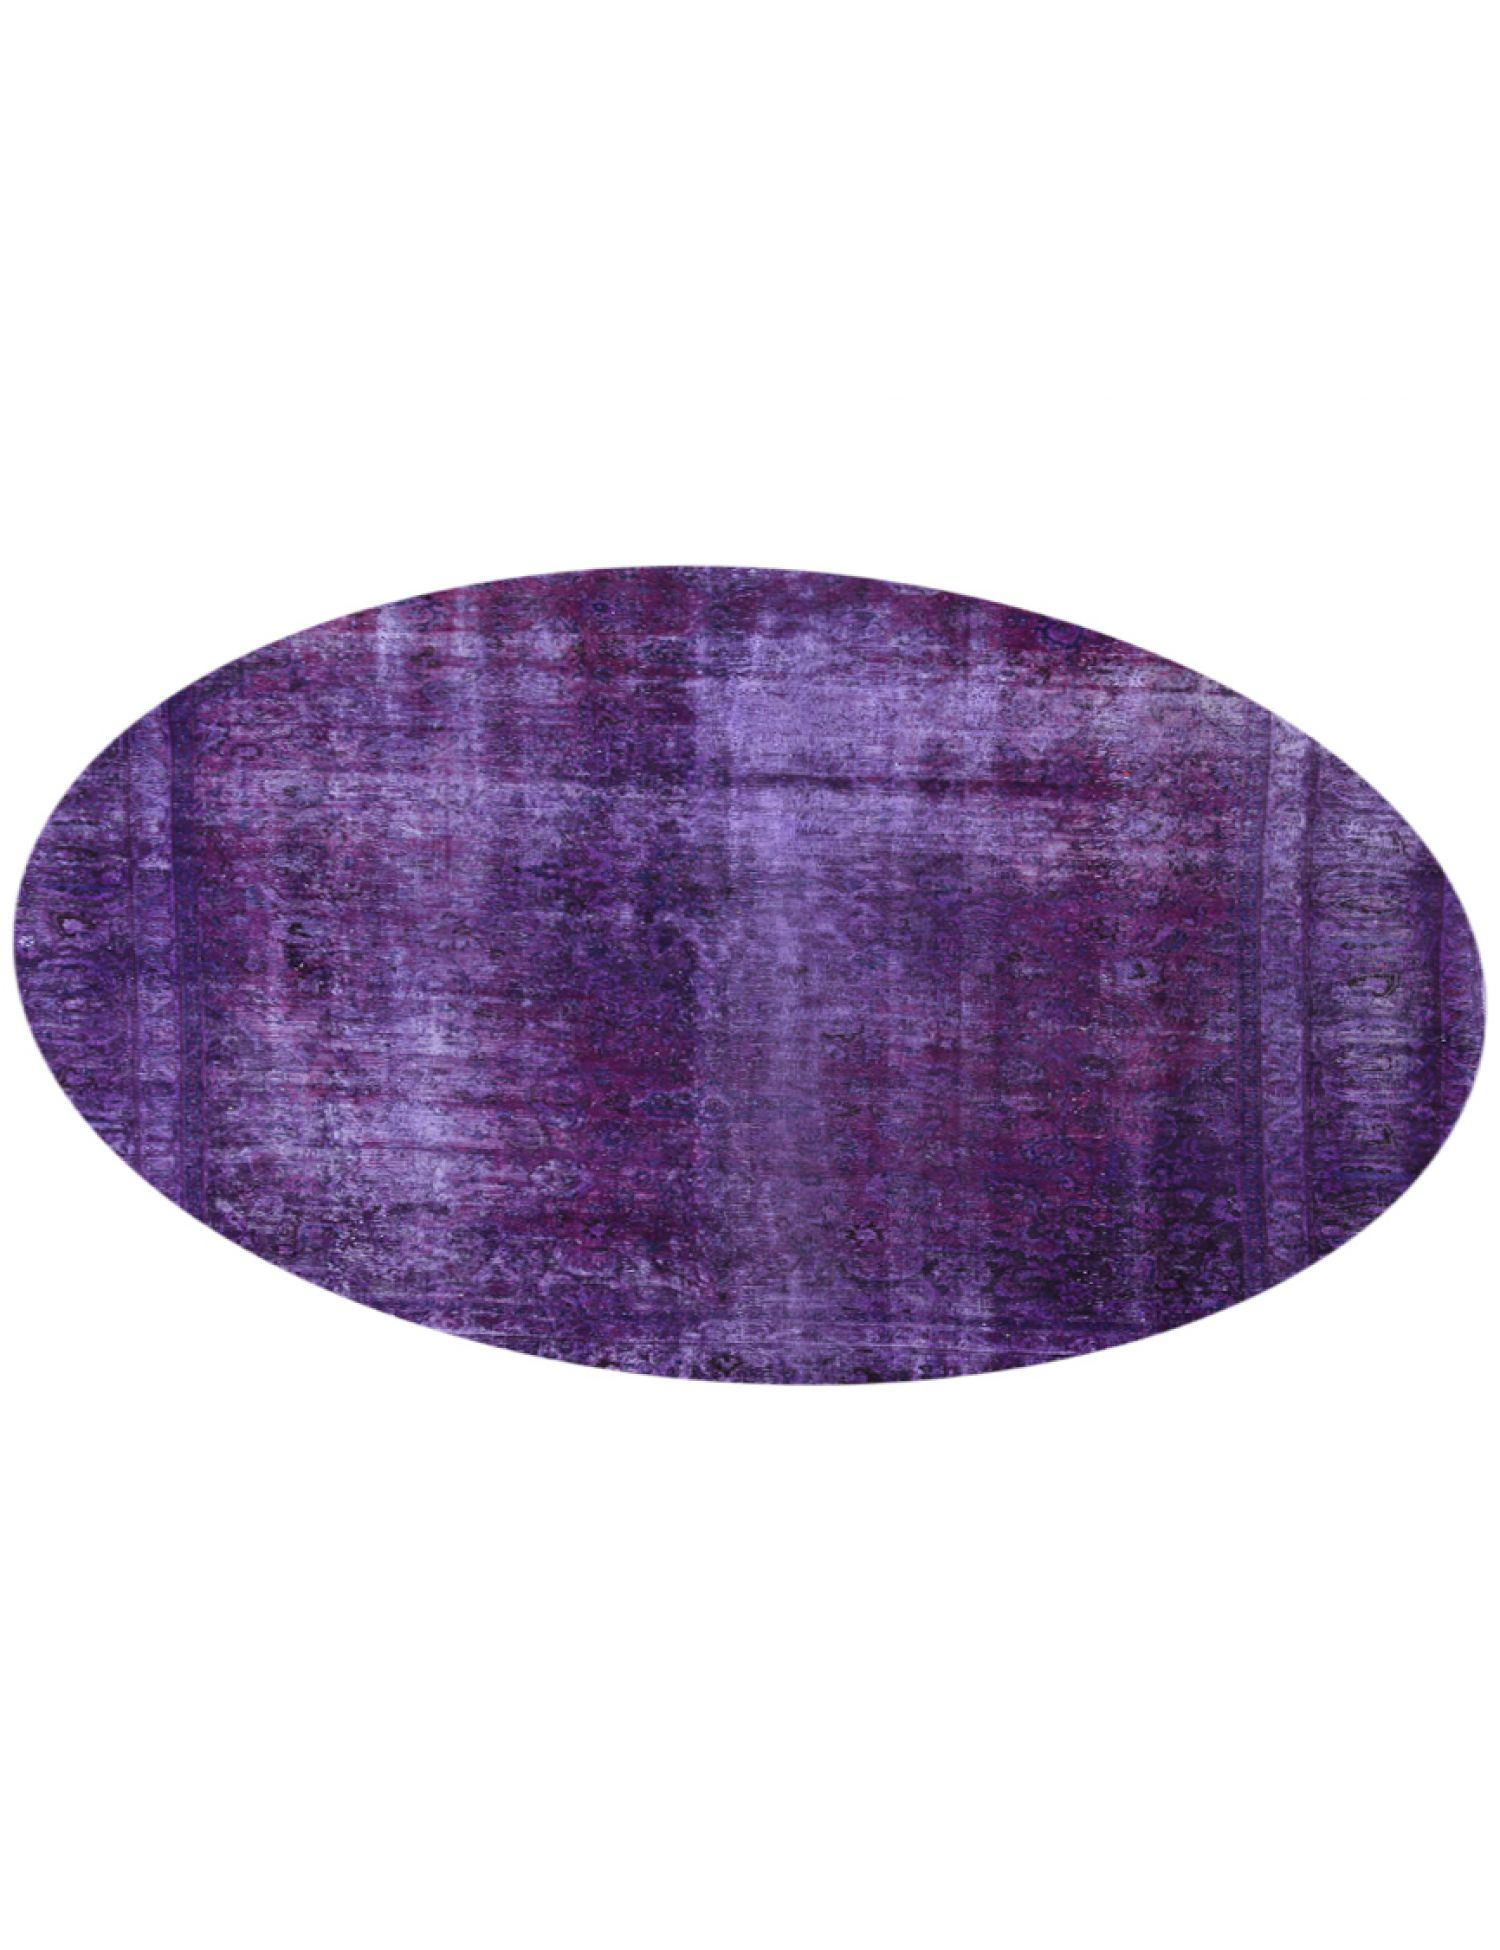 Tappeto Vintage  viola <br/>264 x 264 cm